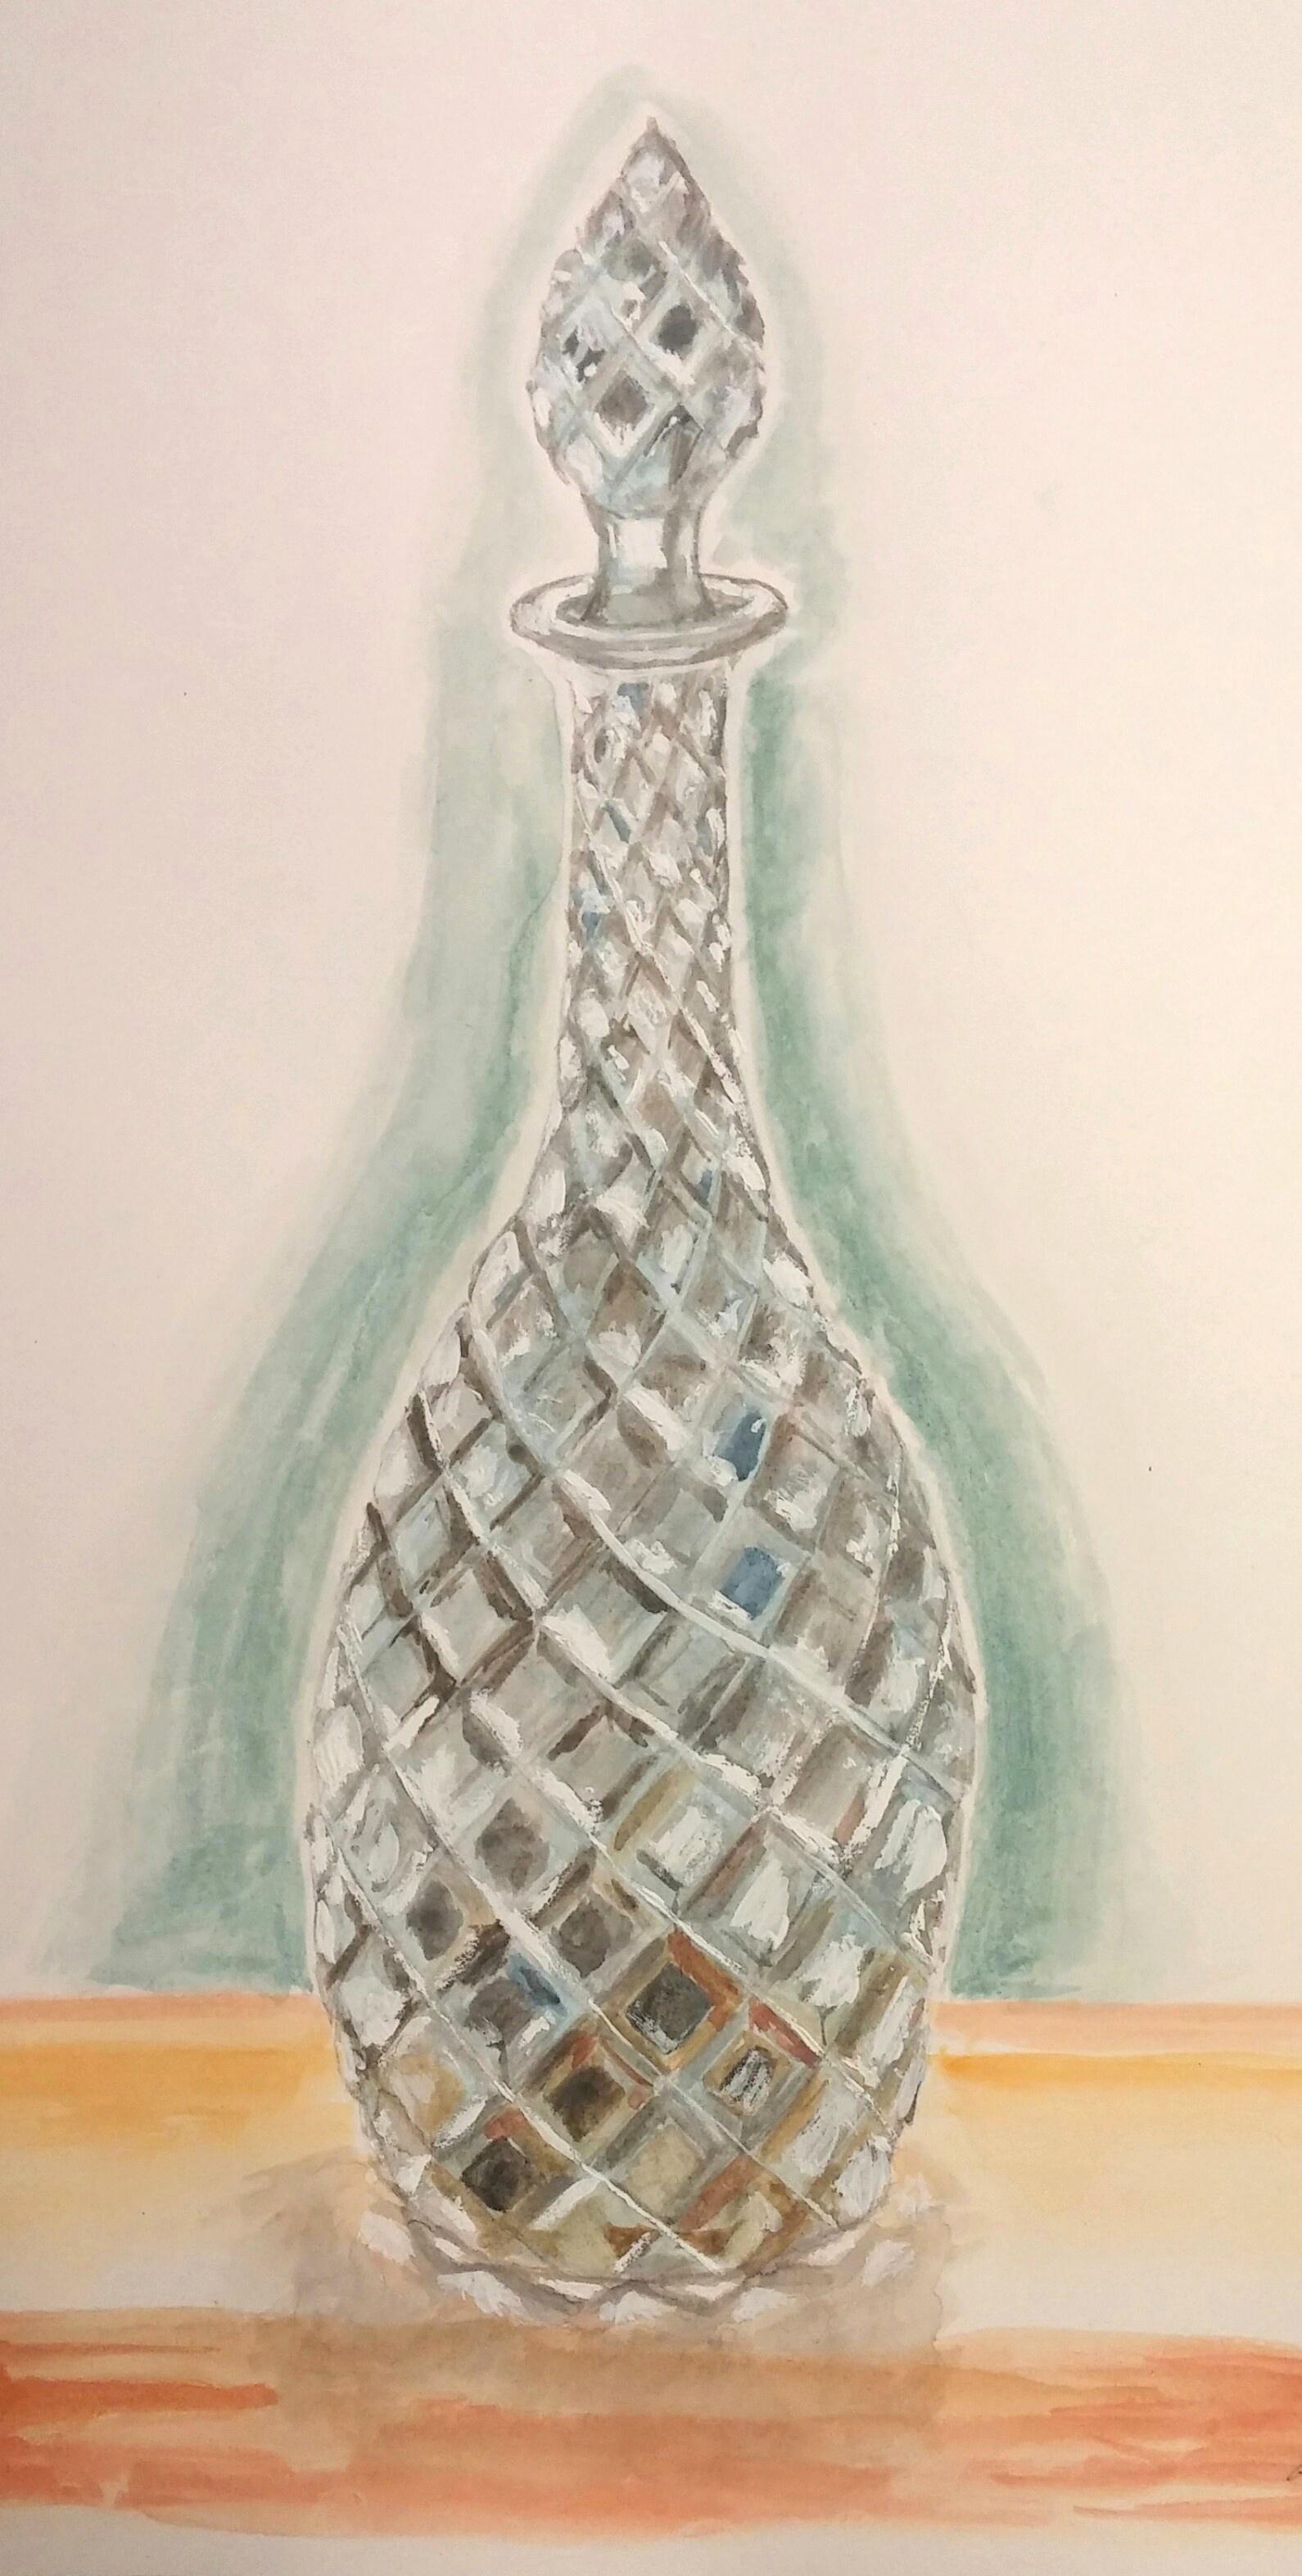 Shiny Vase - Watercolor Experiment